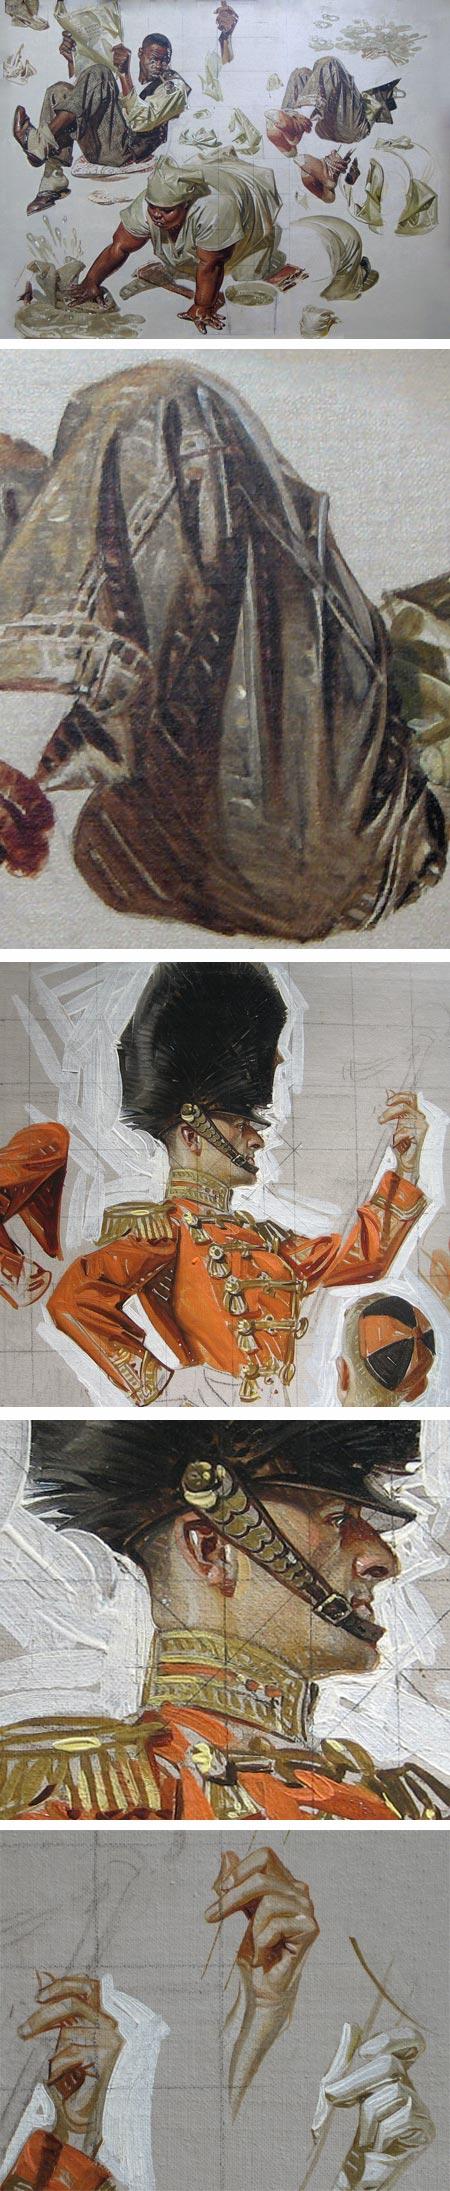 J.C. Leyendecker on Illustration Art